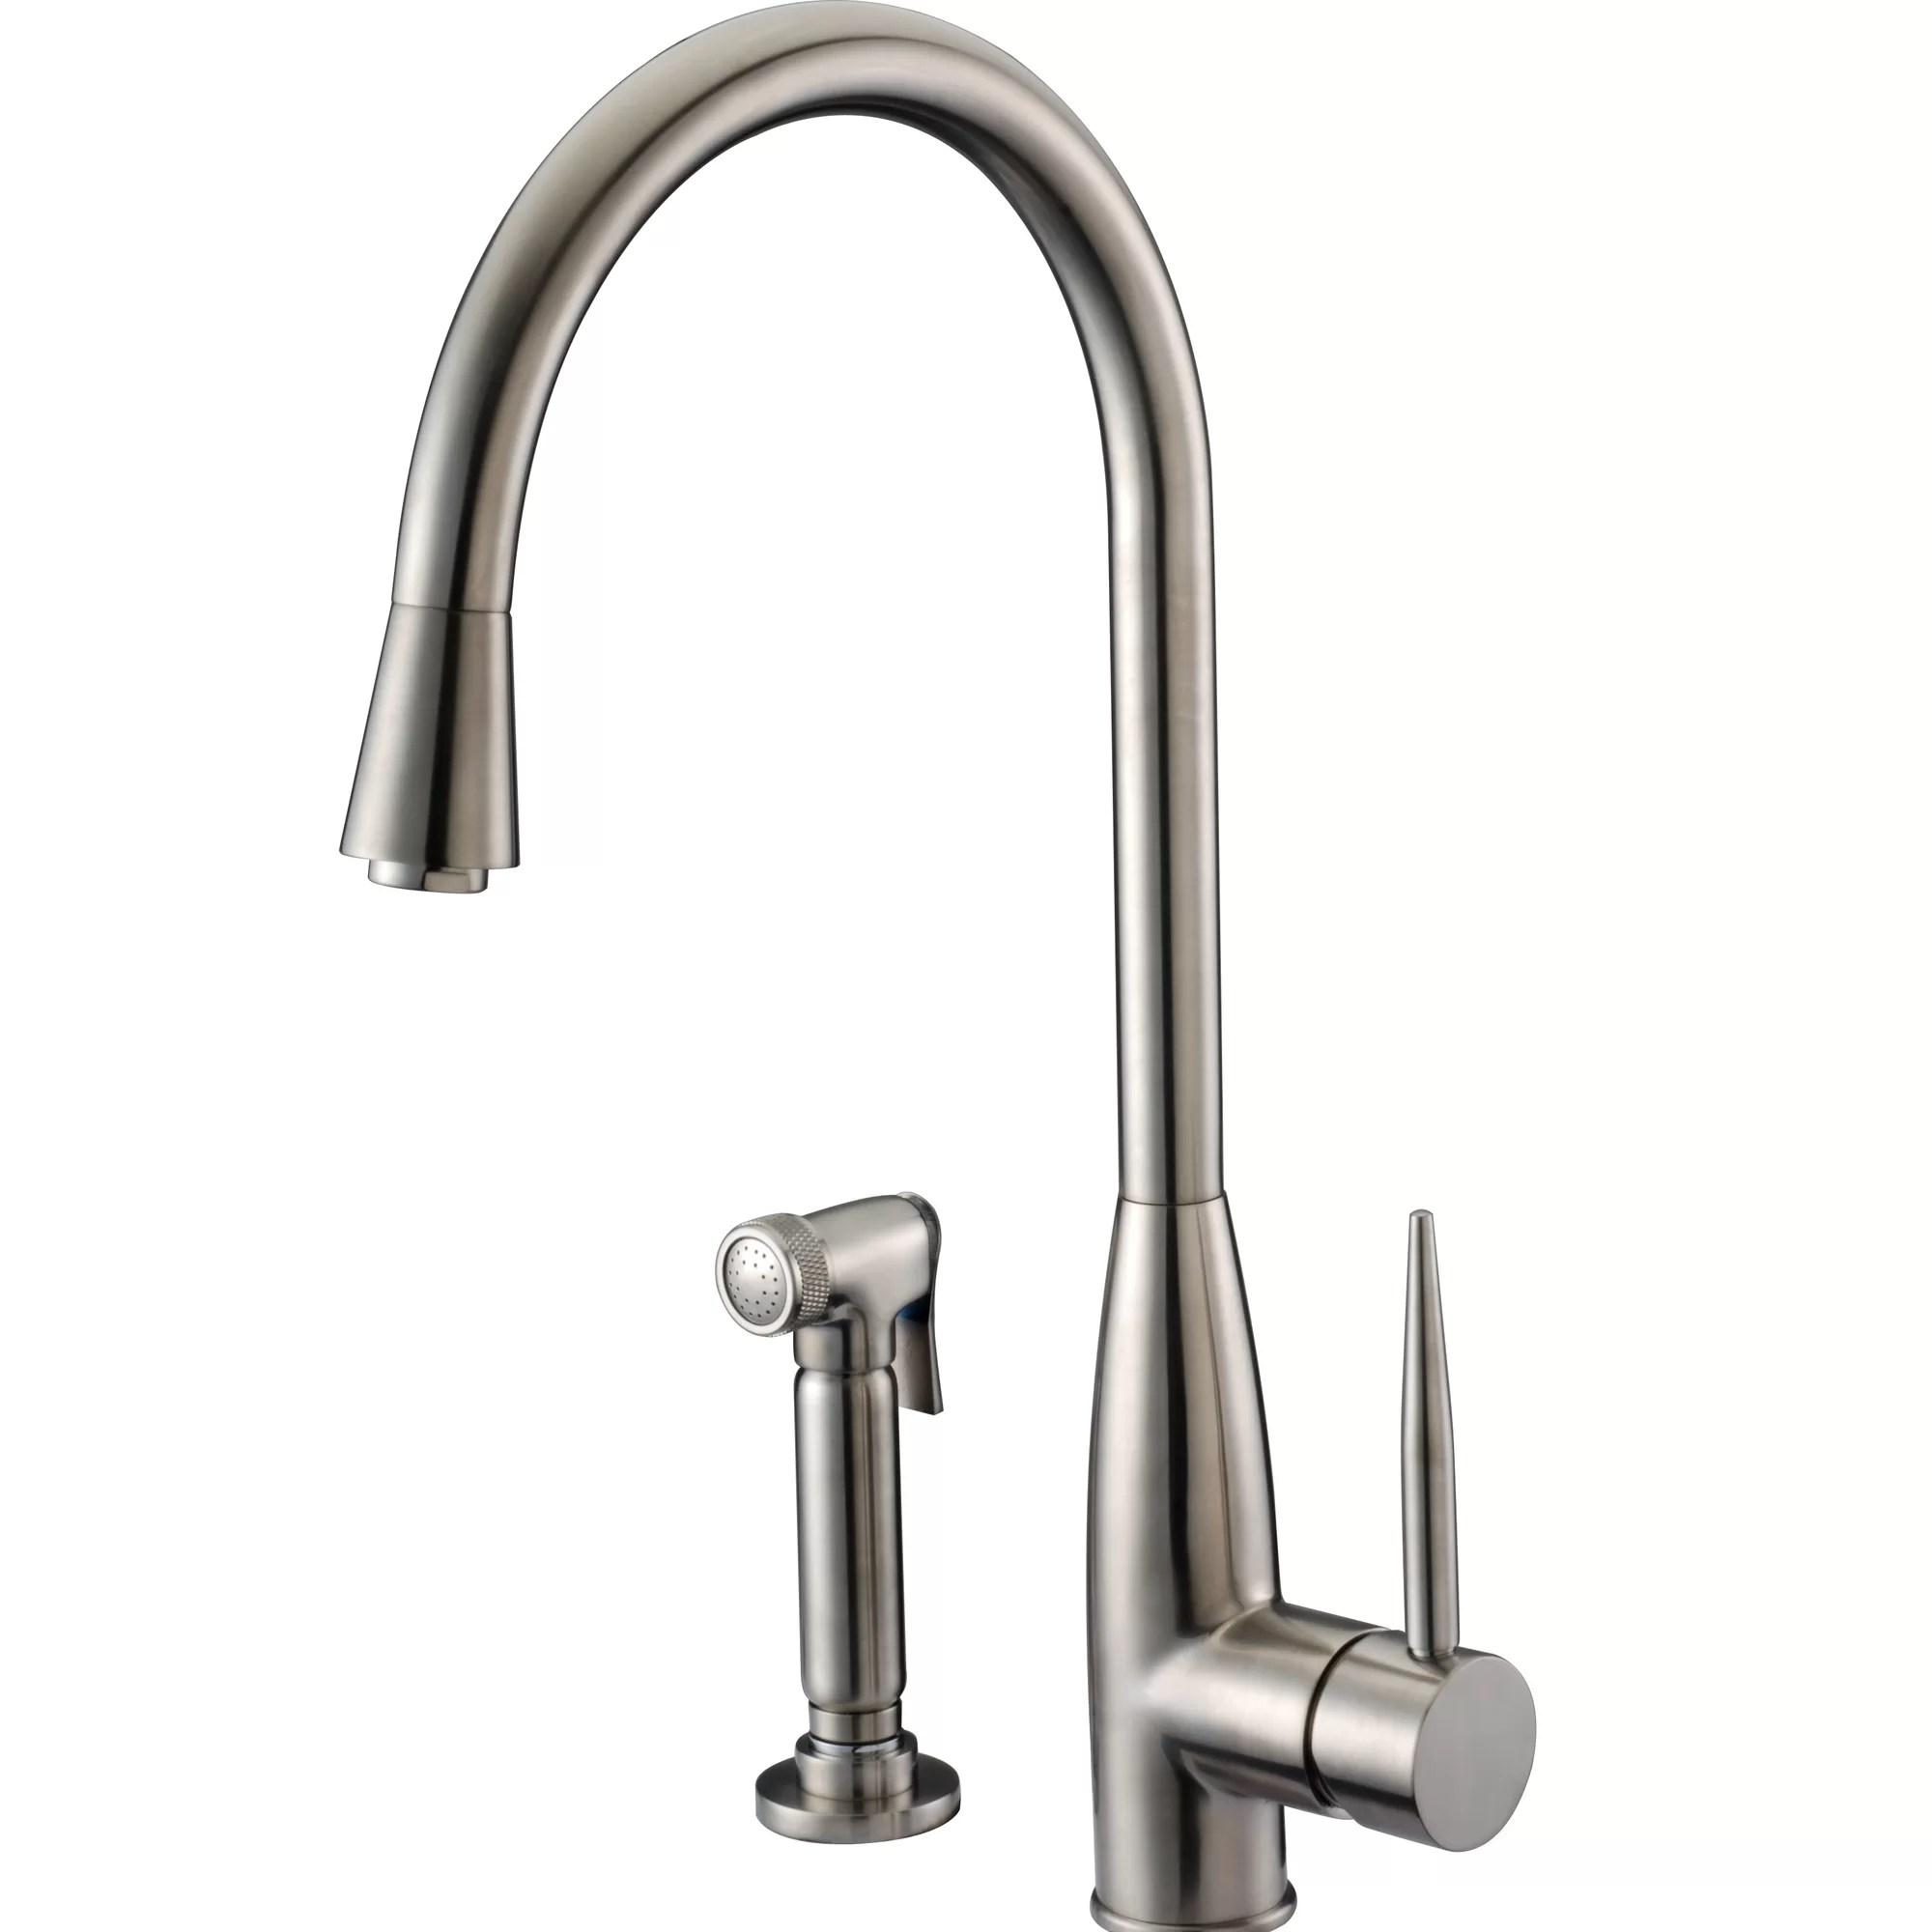 kitchen faucet with side sprayer brick tiles for backsplash in dawn usa single handle deck mount